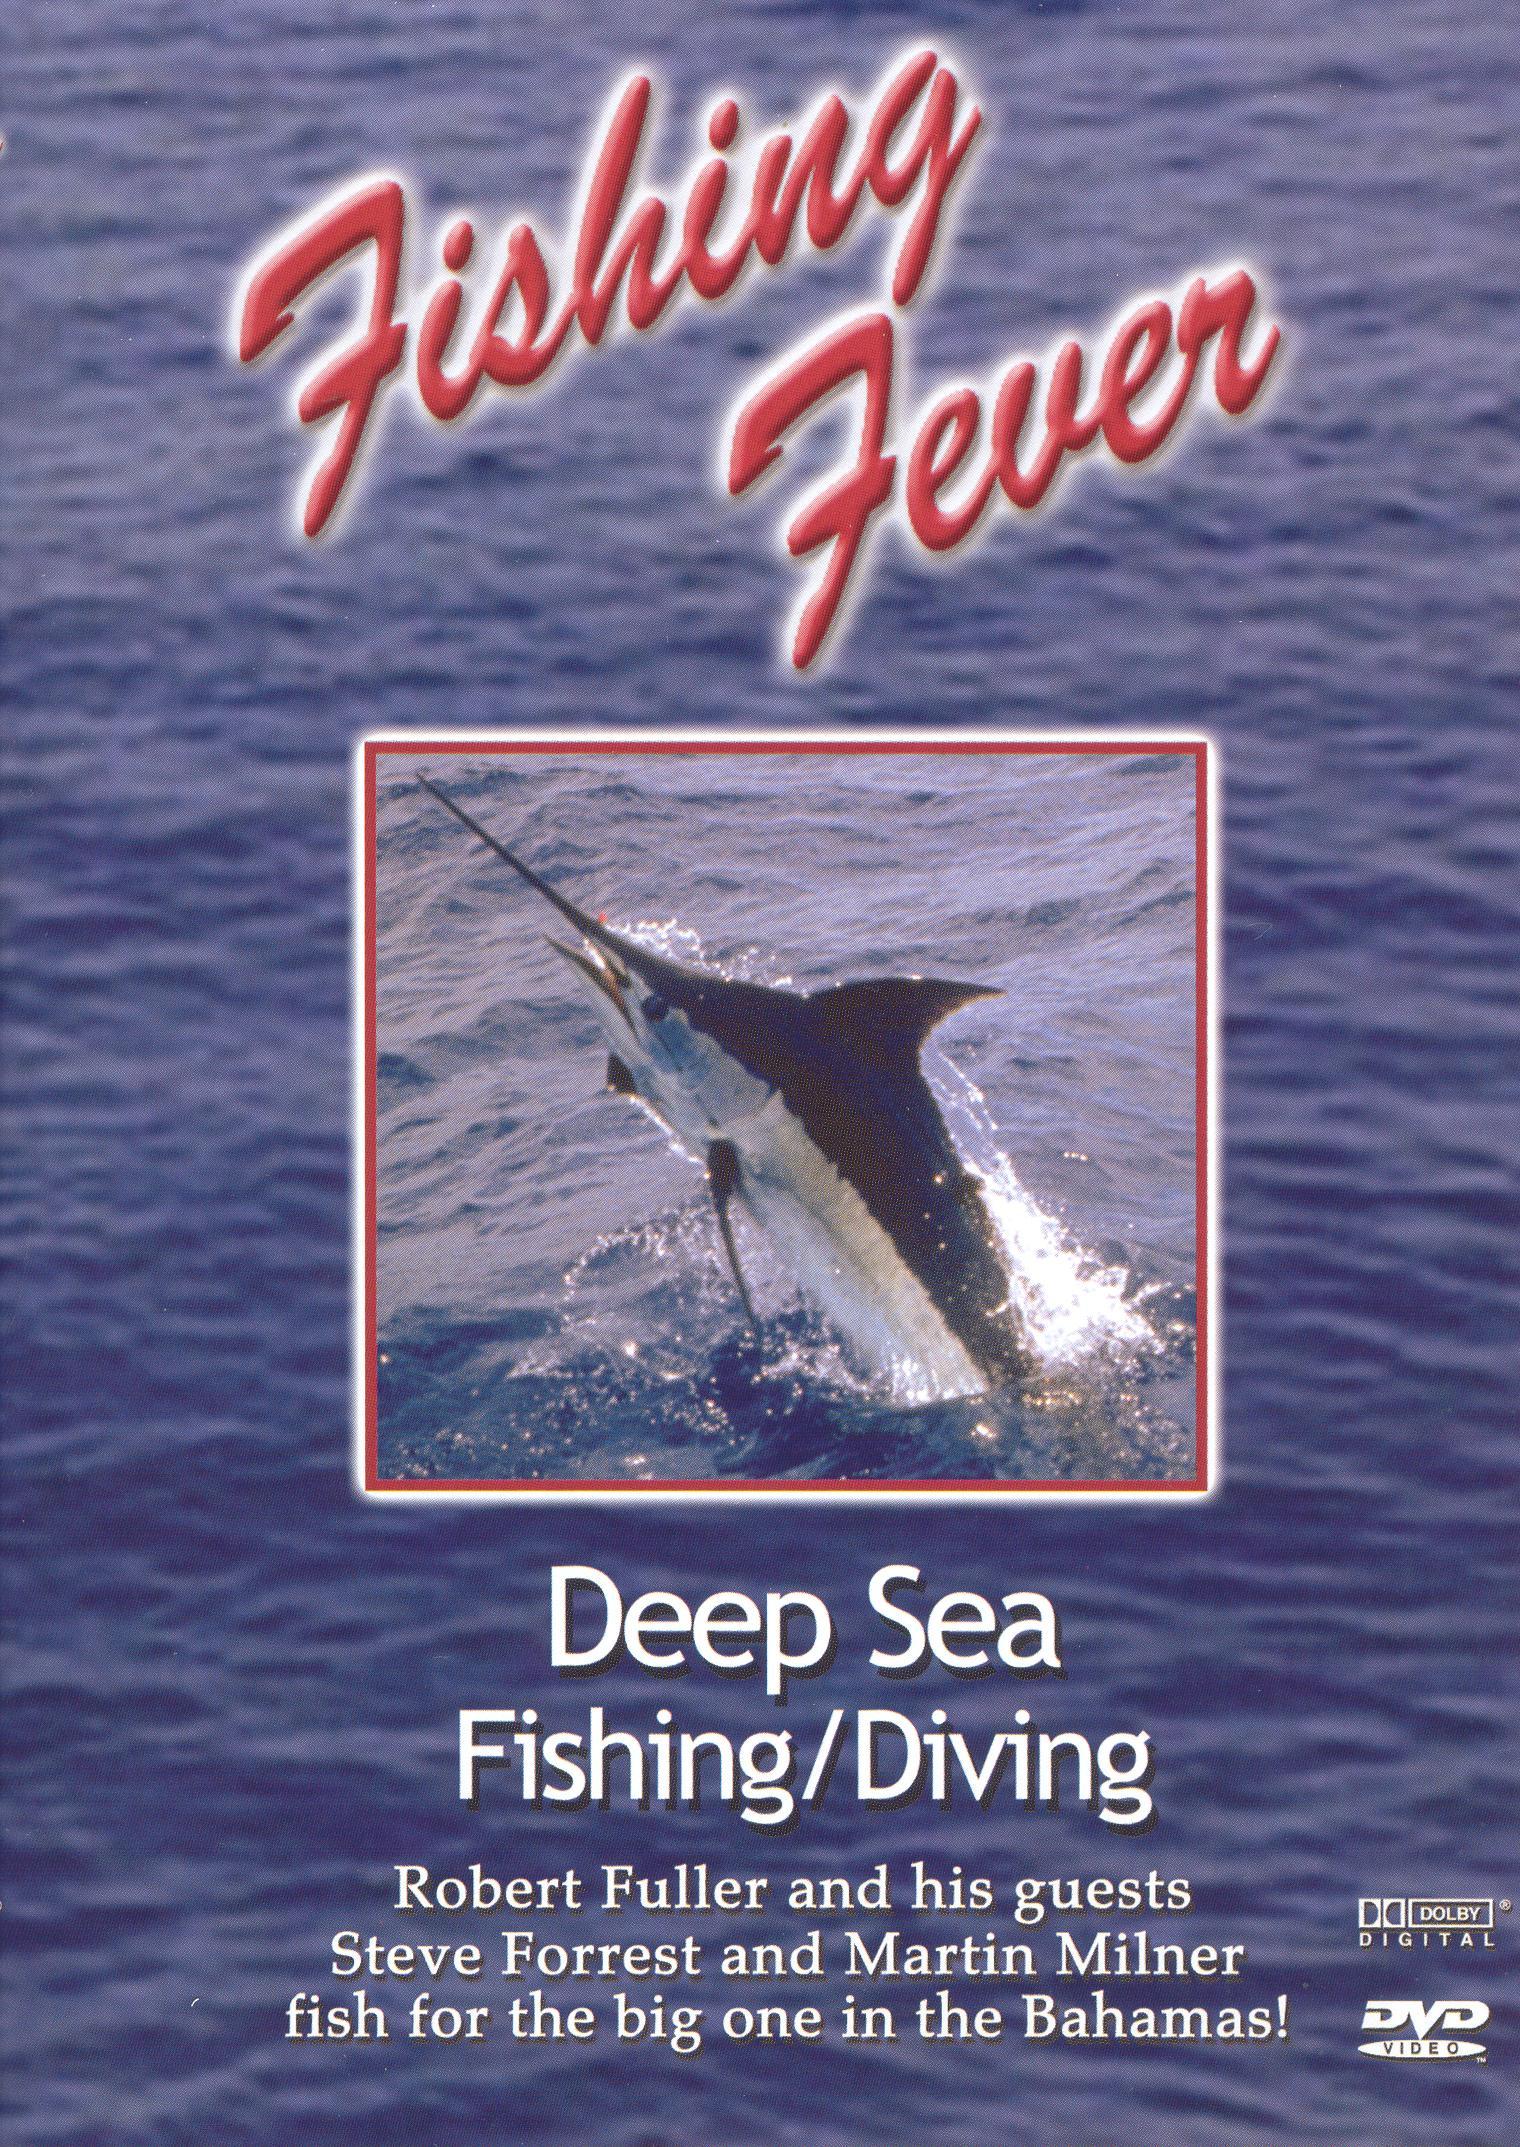 Fishing Fever: Deep Sea Fishing and Diving, Vol. 2